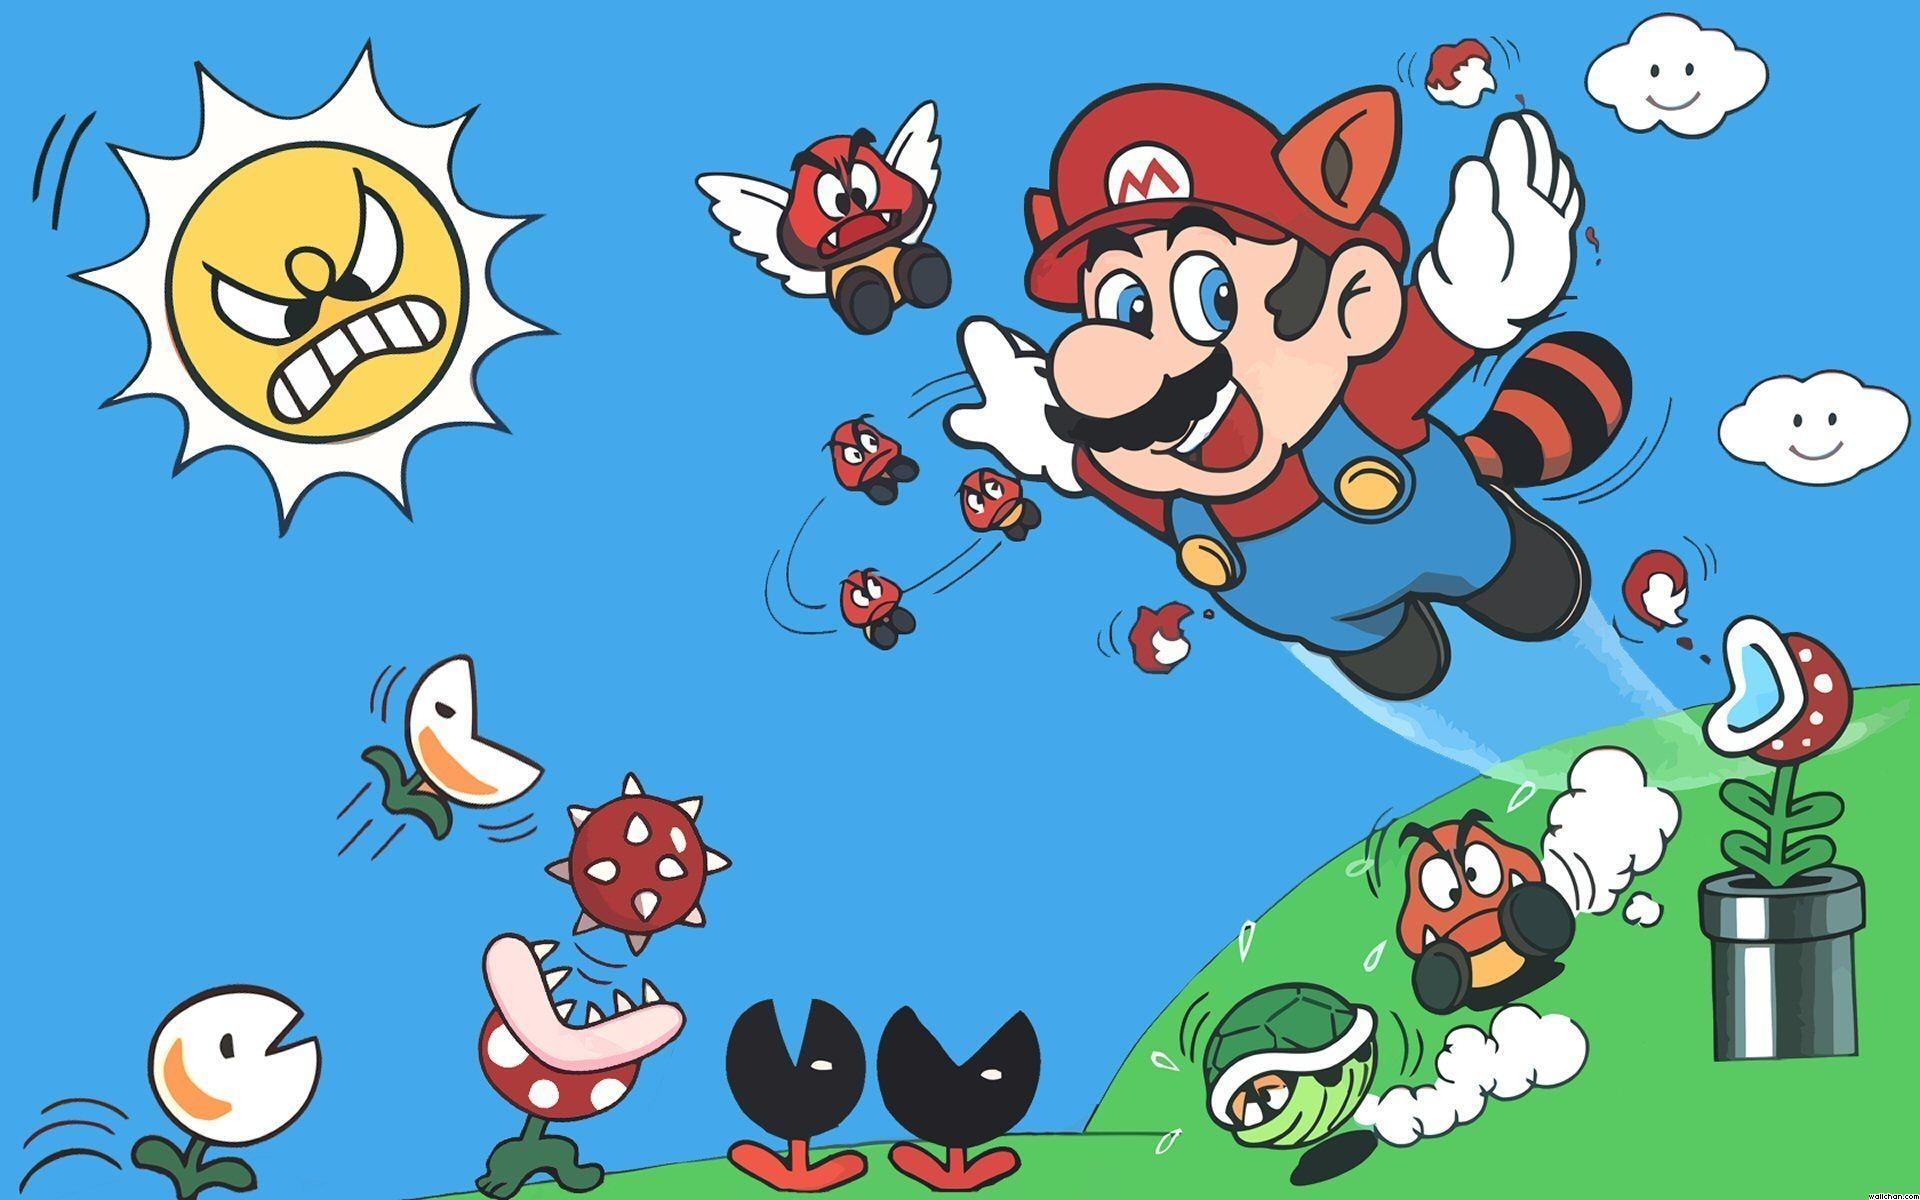 Games Wallpaper: Super Mario Wallpaper 8 Bit Wallpapers with High .